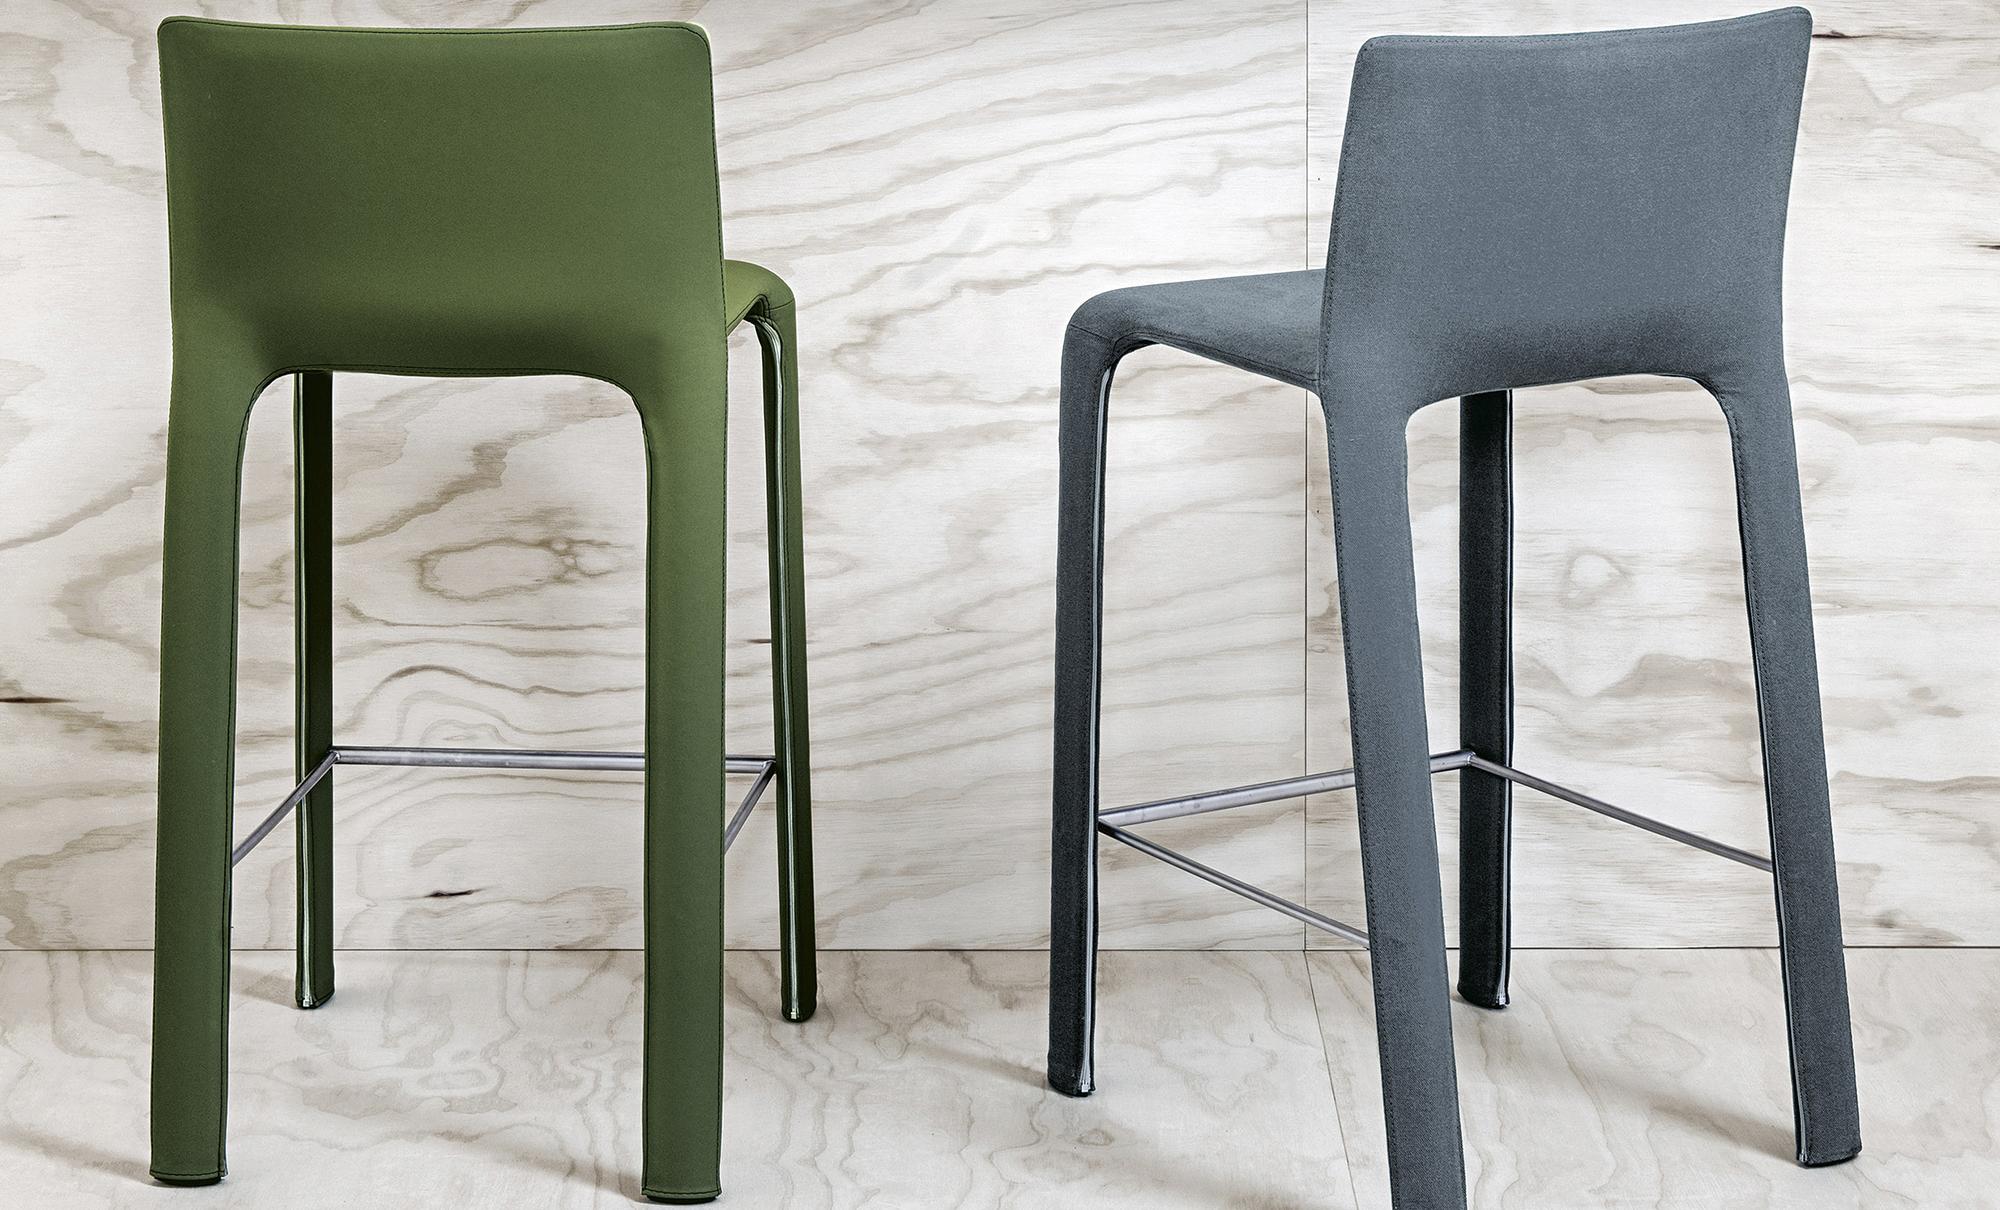 Joko Stool Stools Fanuli Furniture